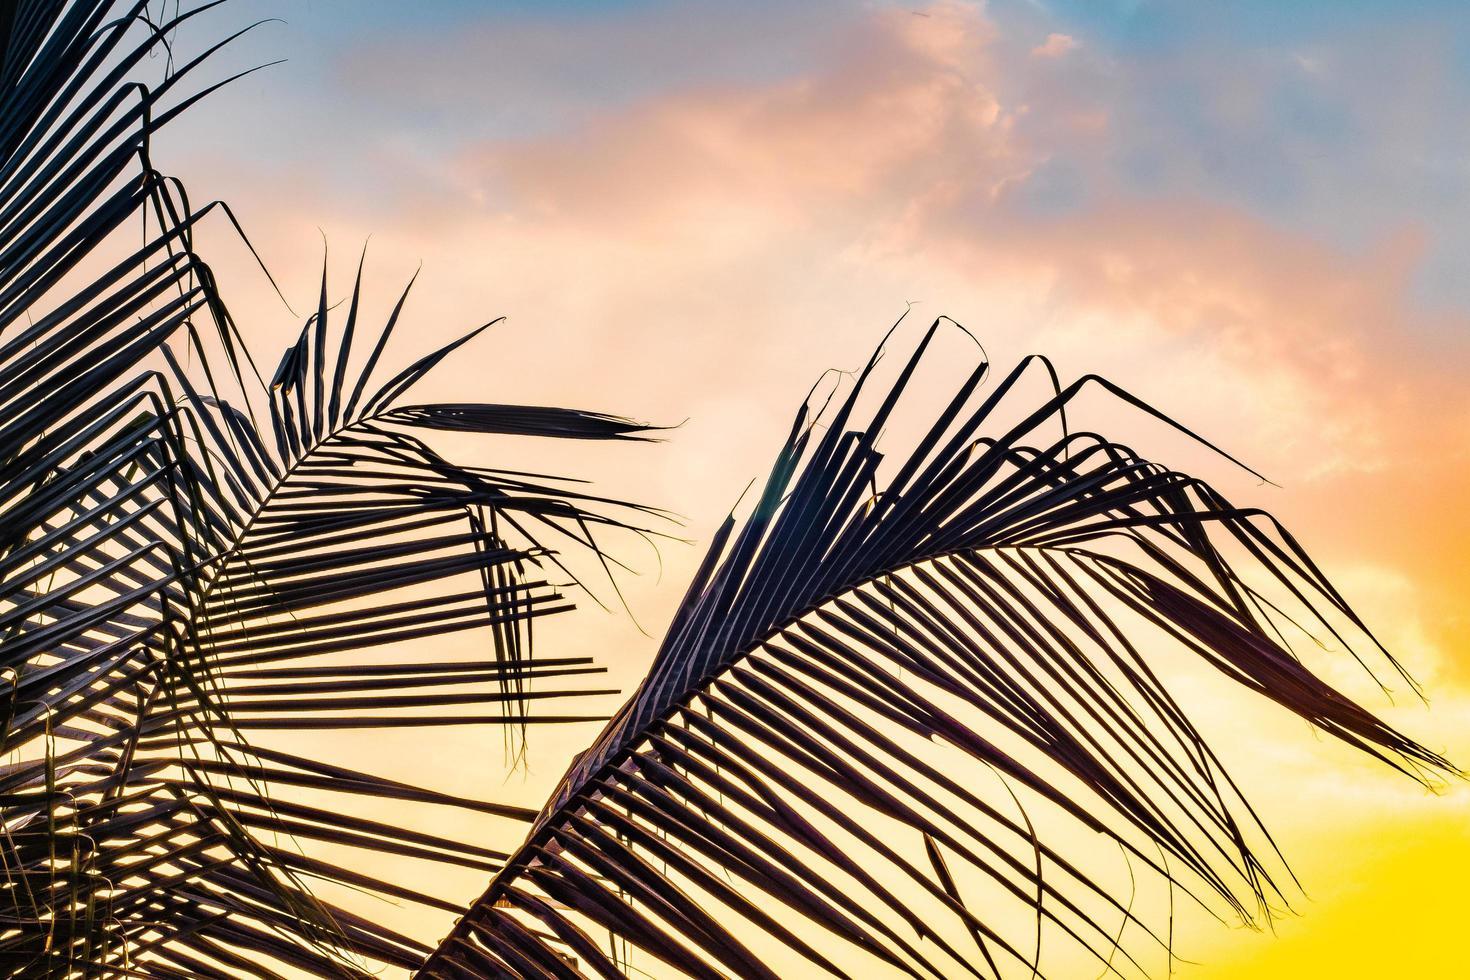 Palmen gegen einen Sonnenuntergang foto